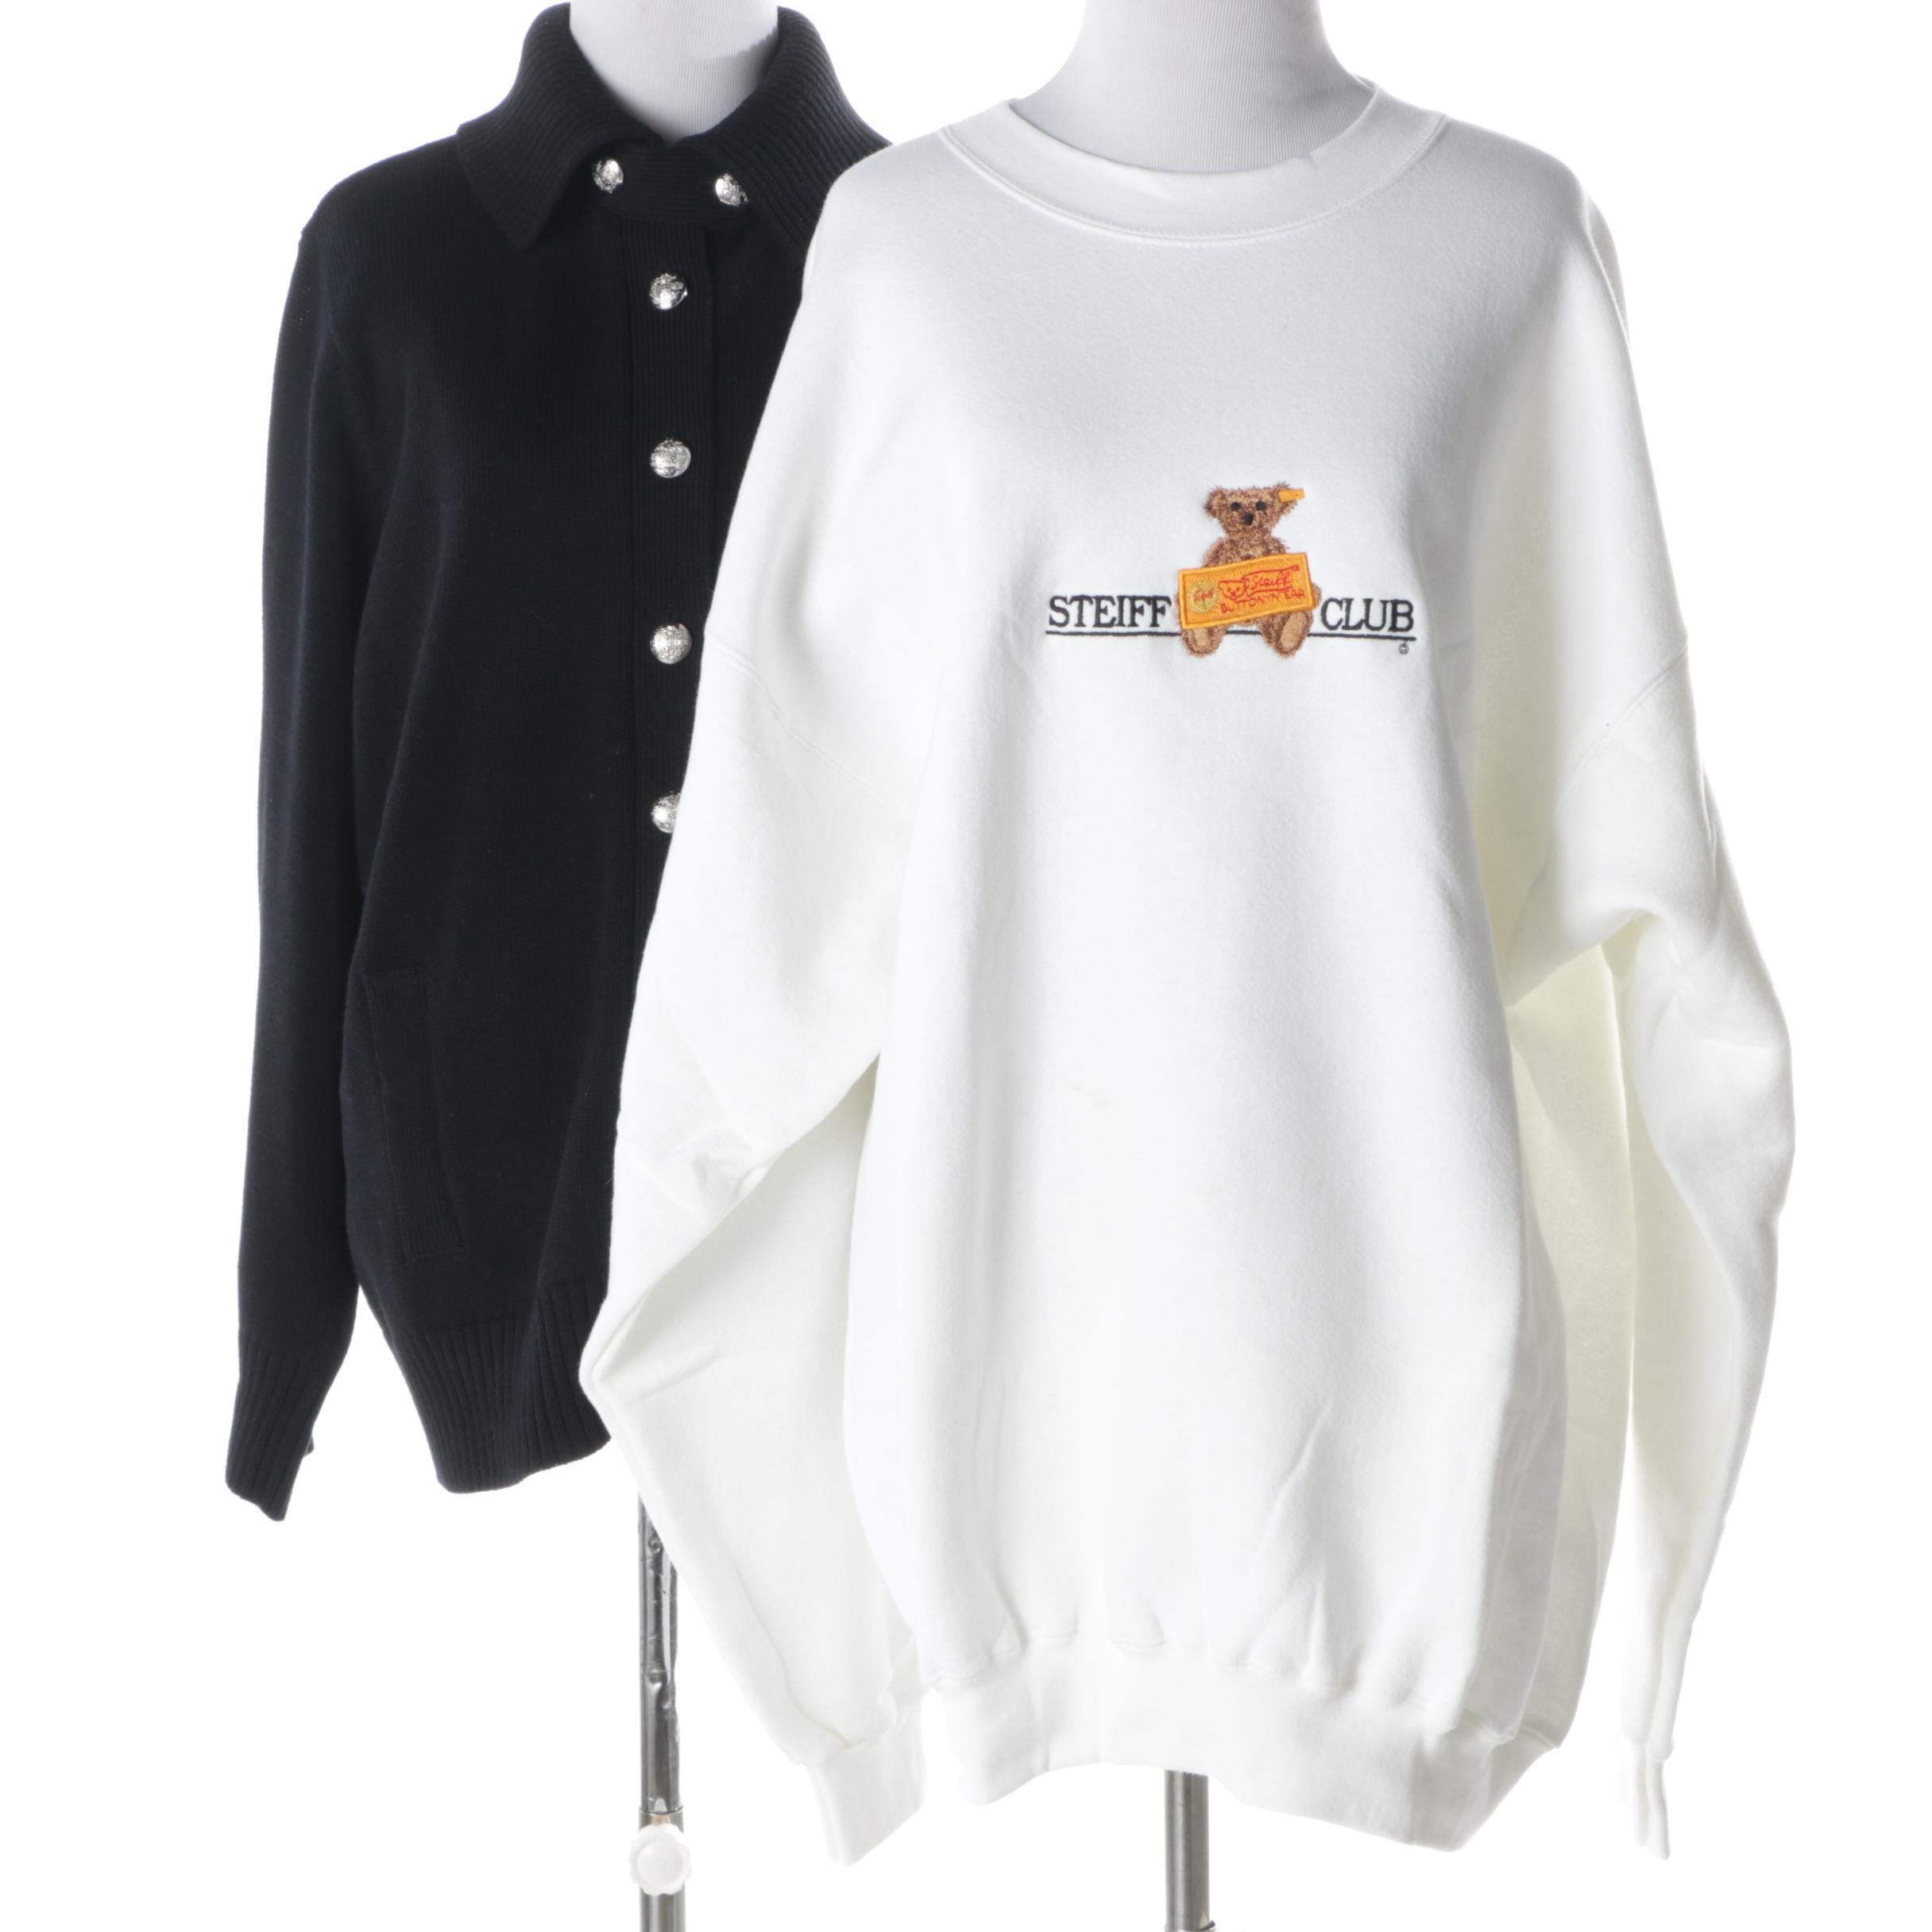 Steiff Club Sweatshirt and LAUREN Ralph Lauren Knit Cardigan